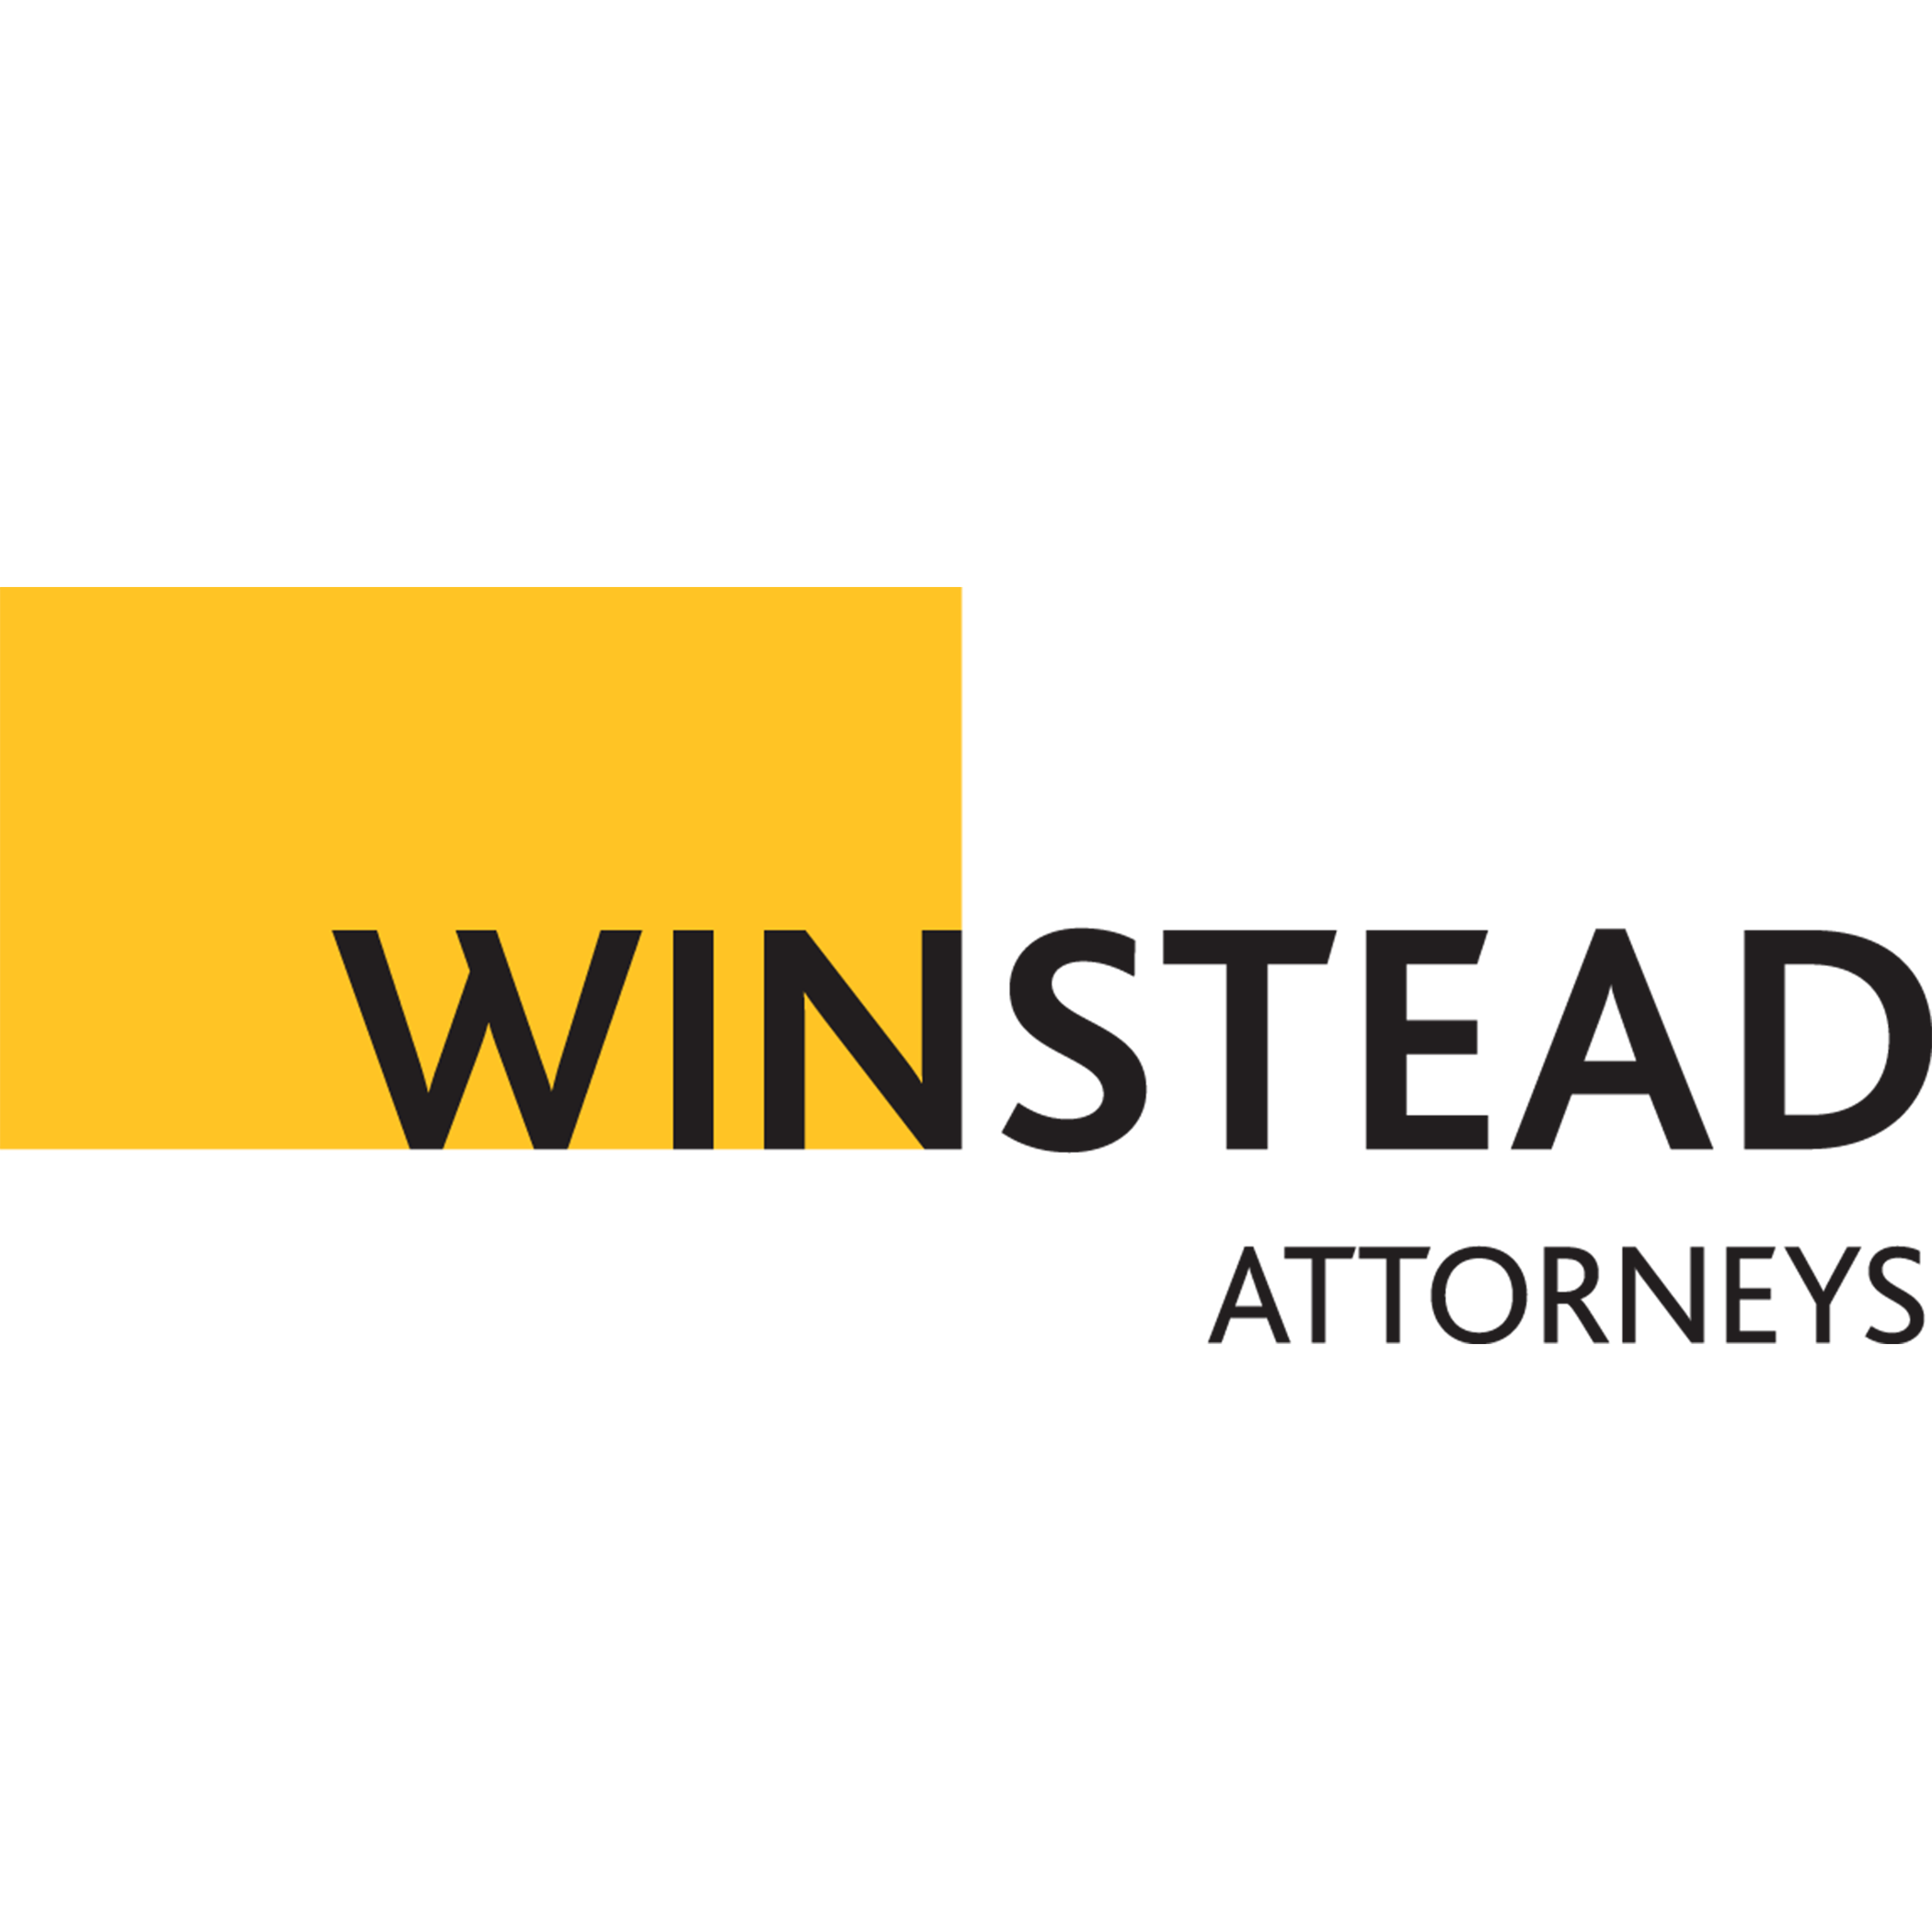 WinsteadColor.jpg